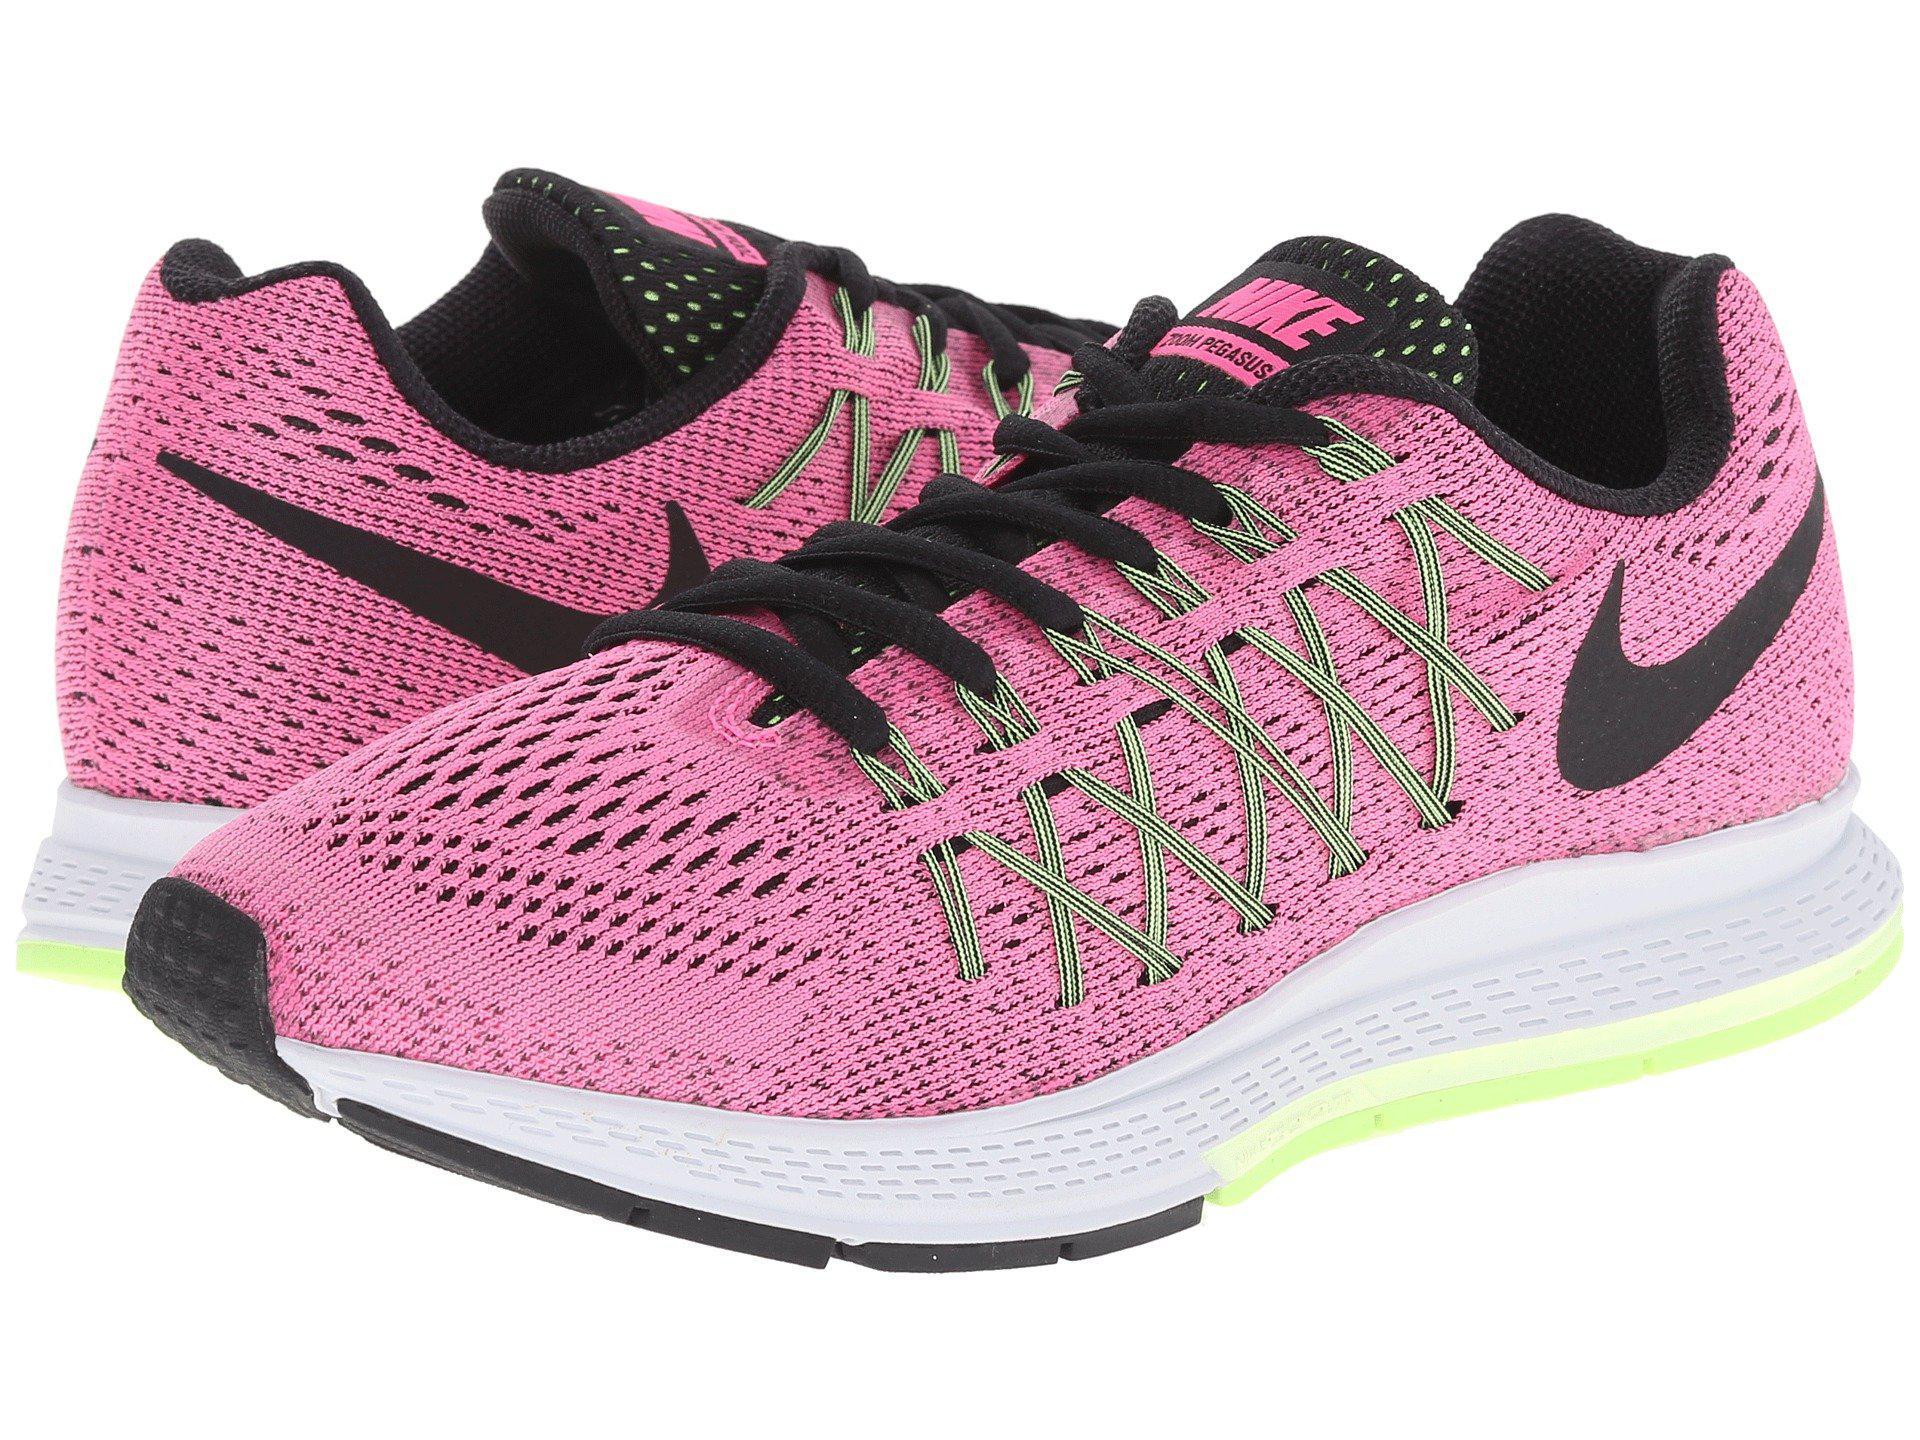 dde542f3b27 Lyst - Nike Air Zoom Pegasus 32 in Pink